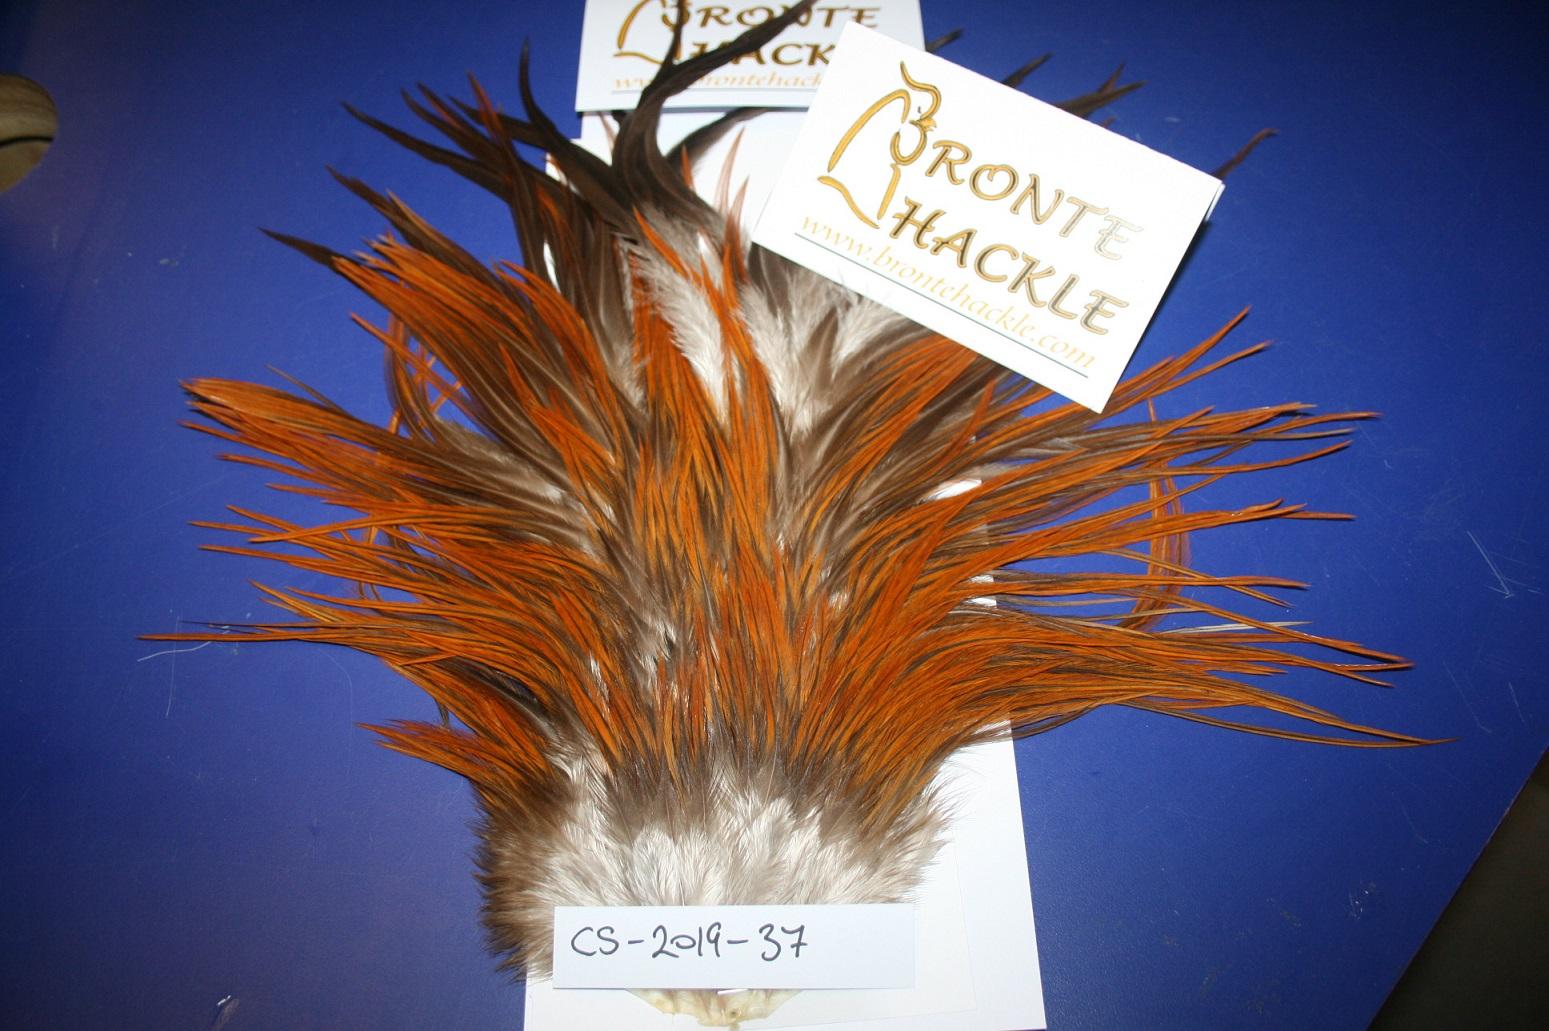 Bronte Hackle Cock Saddles               cs-2019-37